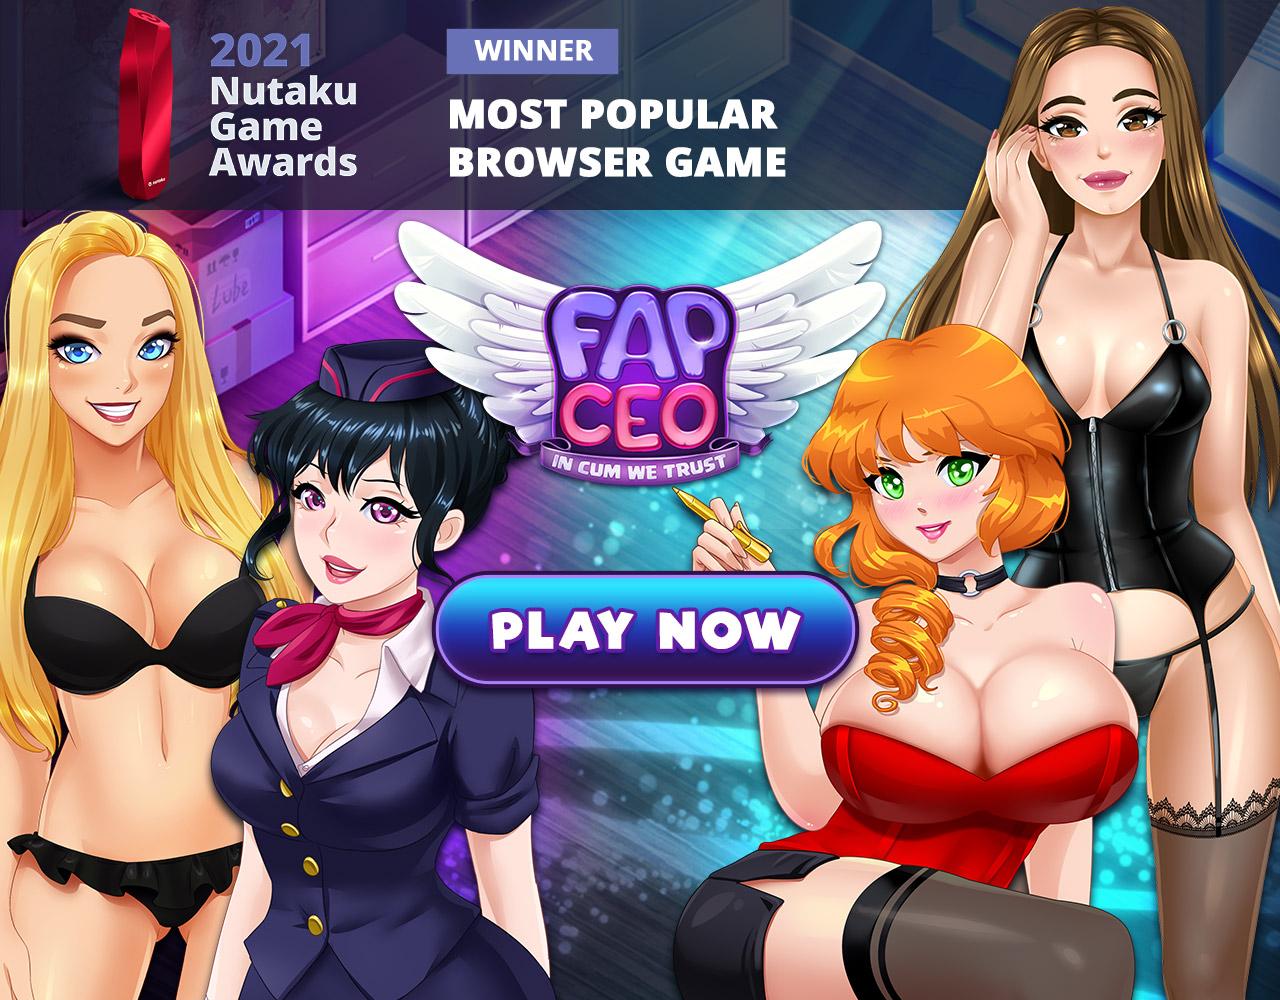 Nutaku Awards - FAP CEO